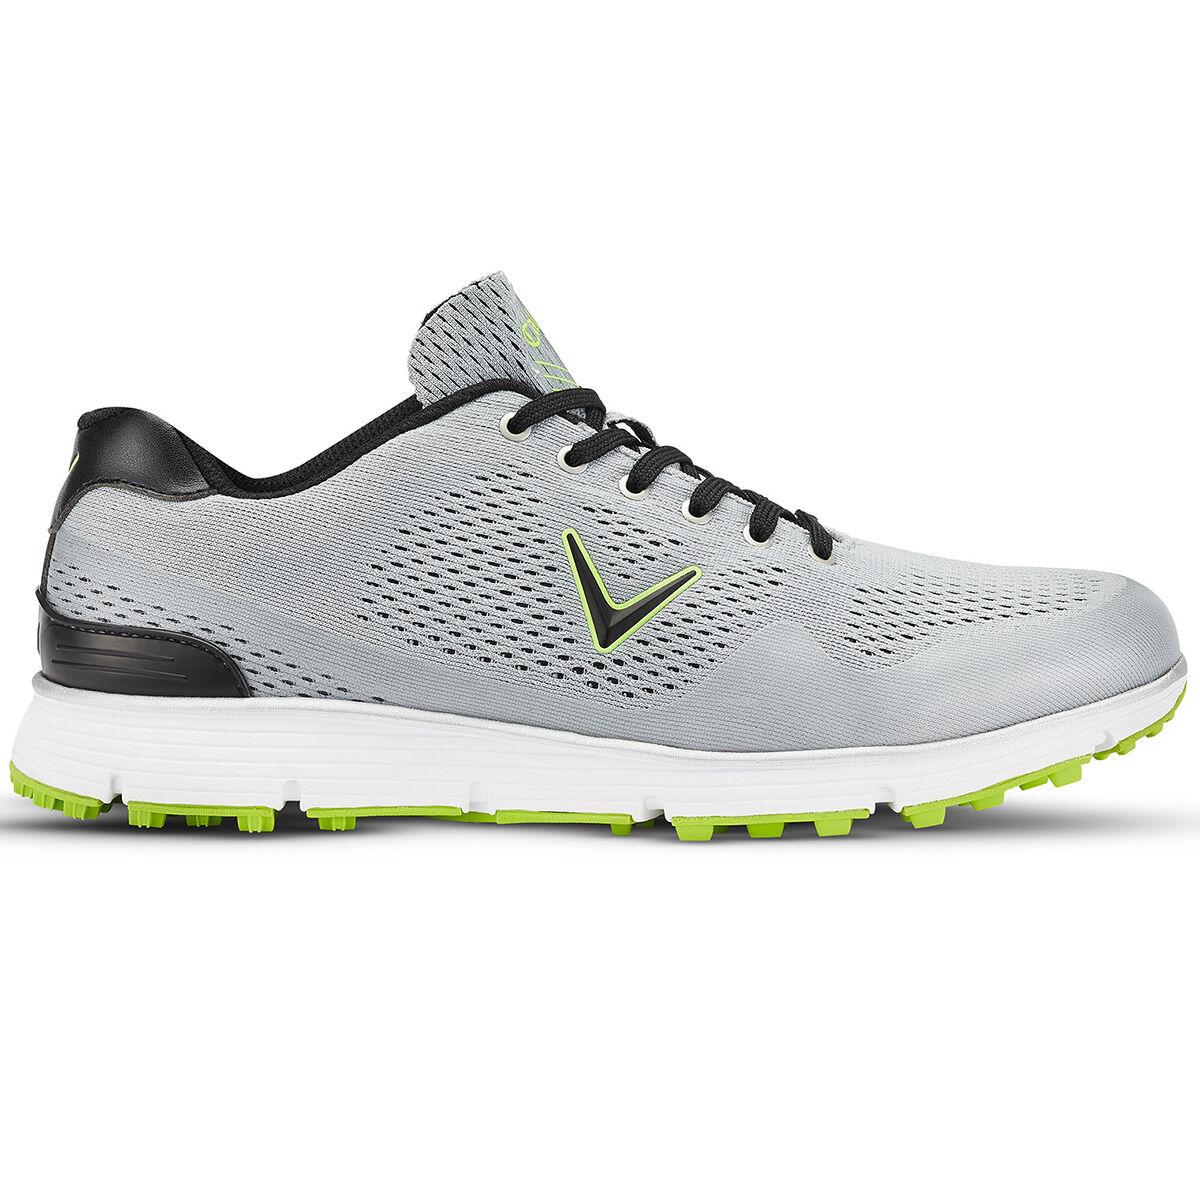 Callaway Golf Chev Vent Shoes | Online Golf